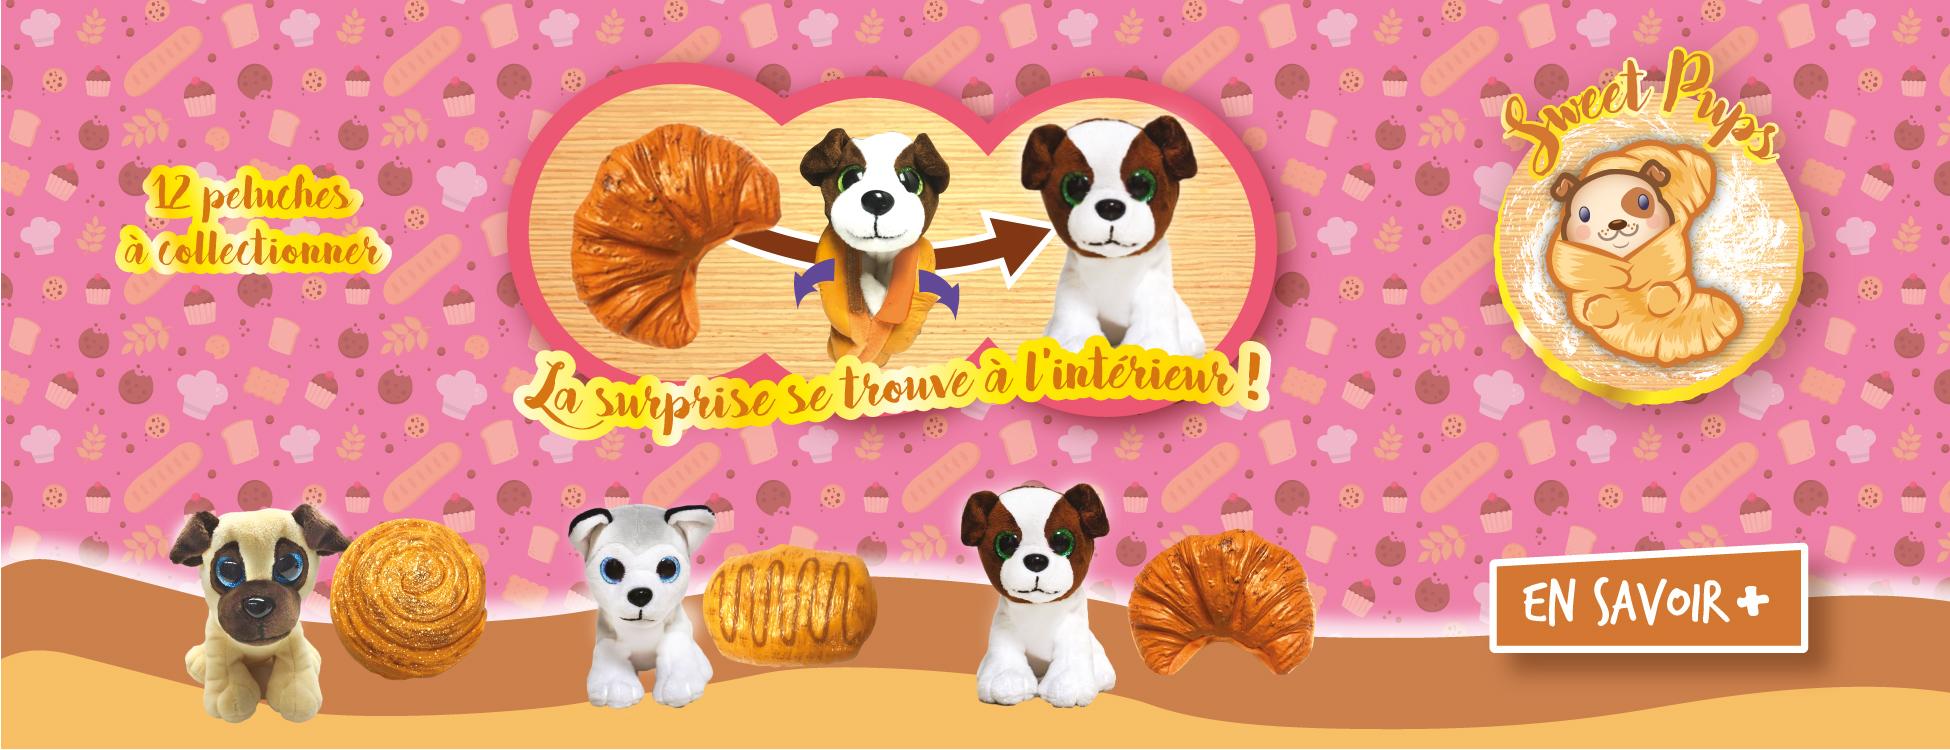 19-01-17_Sweet Pups